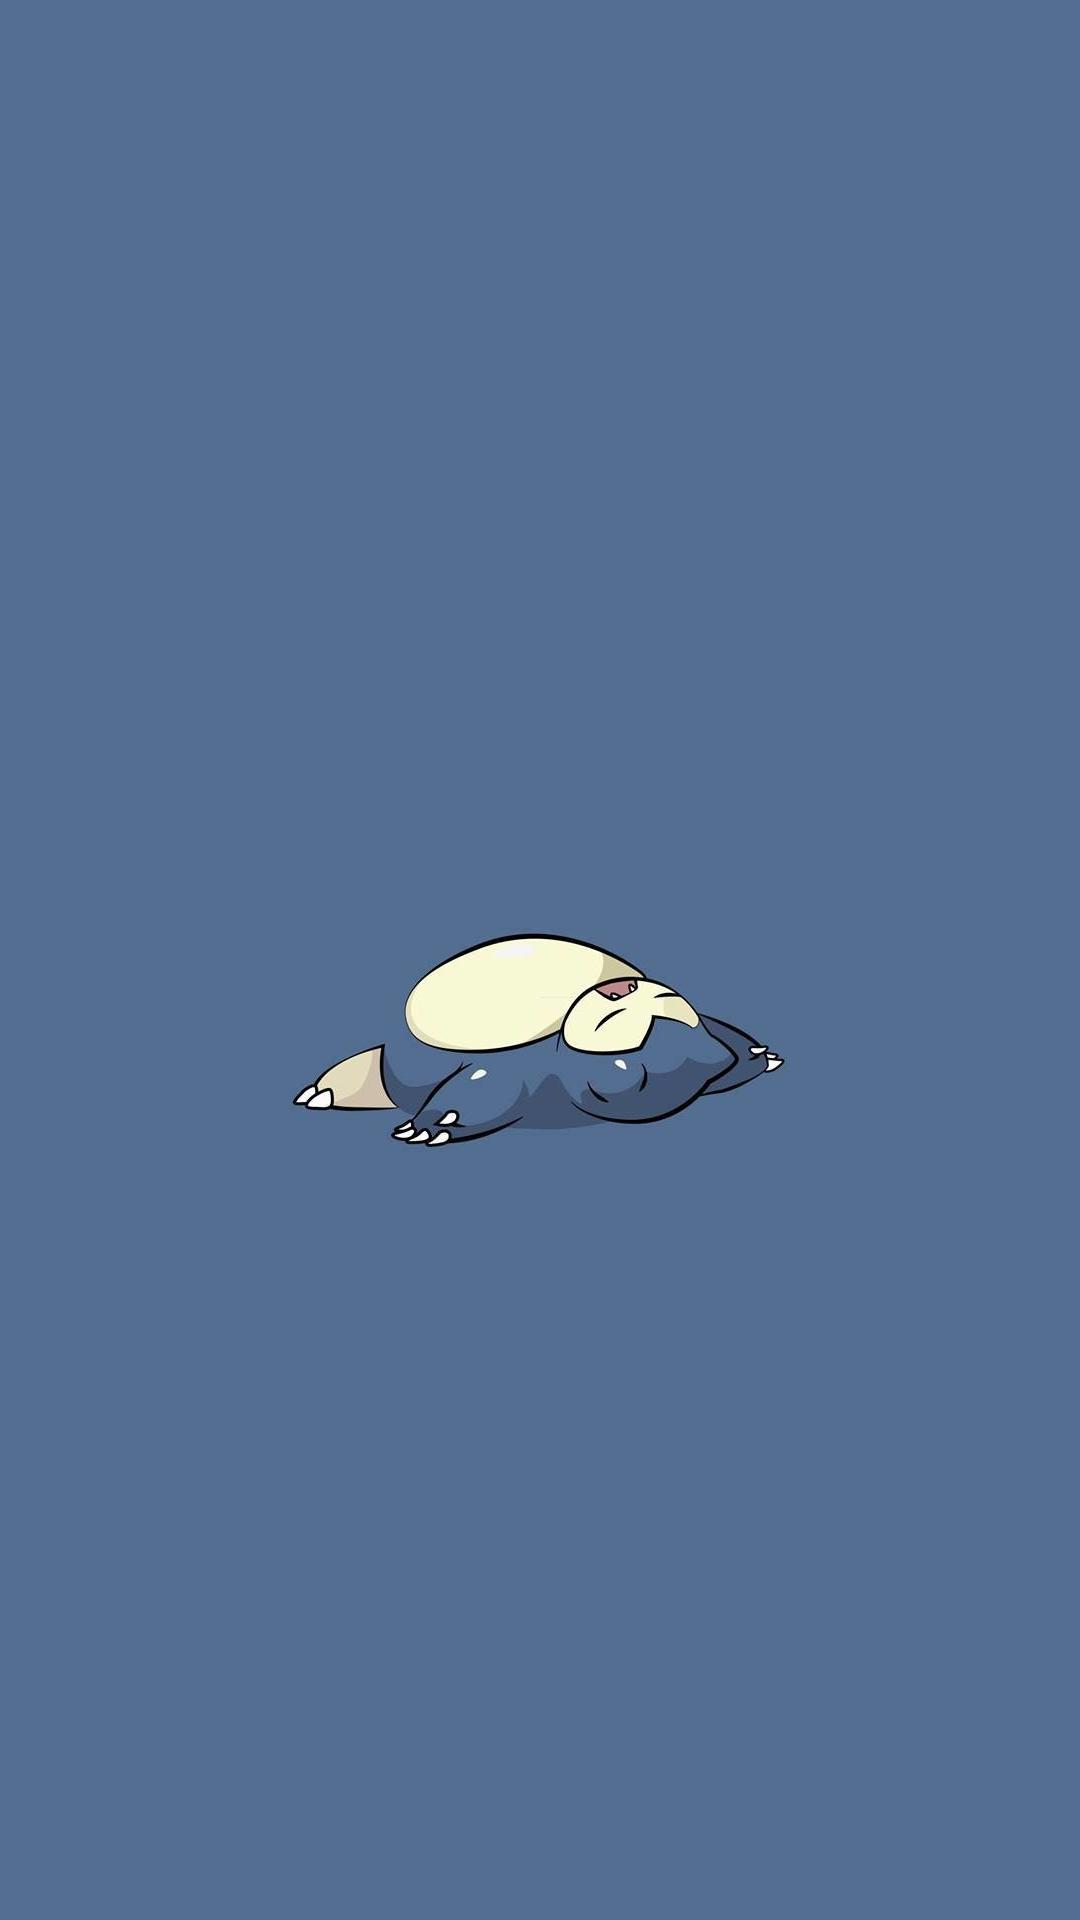 Cute Charizard Wallpaper 【人気99位】カビゴン ポケモンのiphone7壁紙 Iphonex スマホ壁紙 待受画像ギャラリー